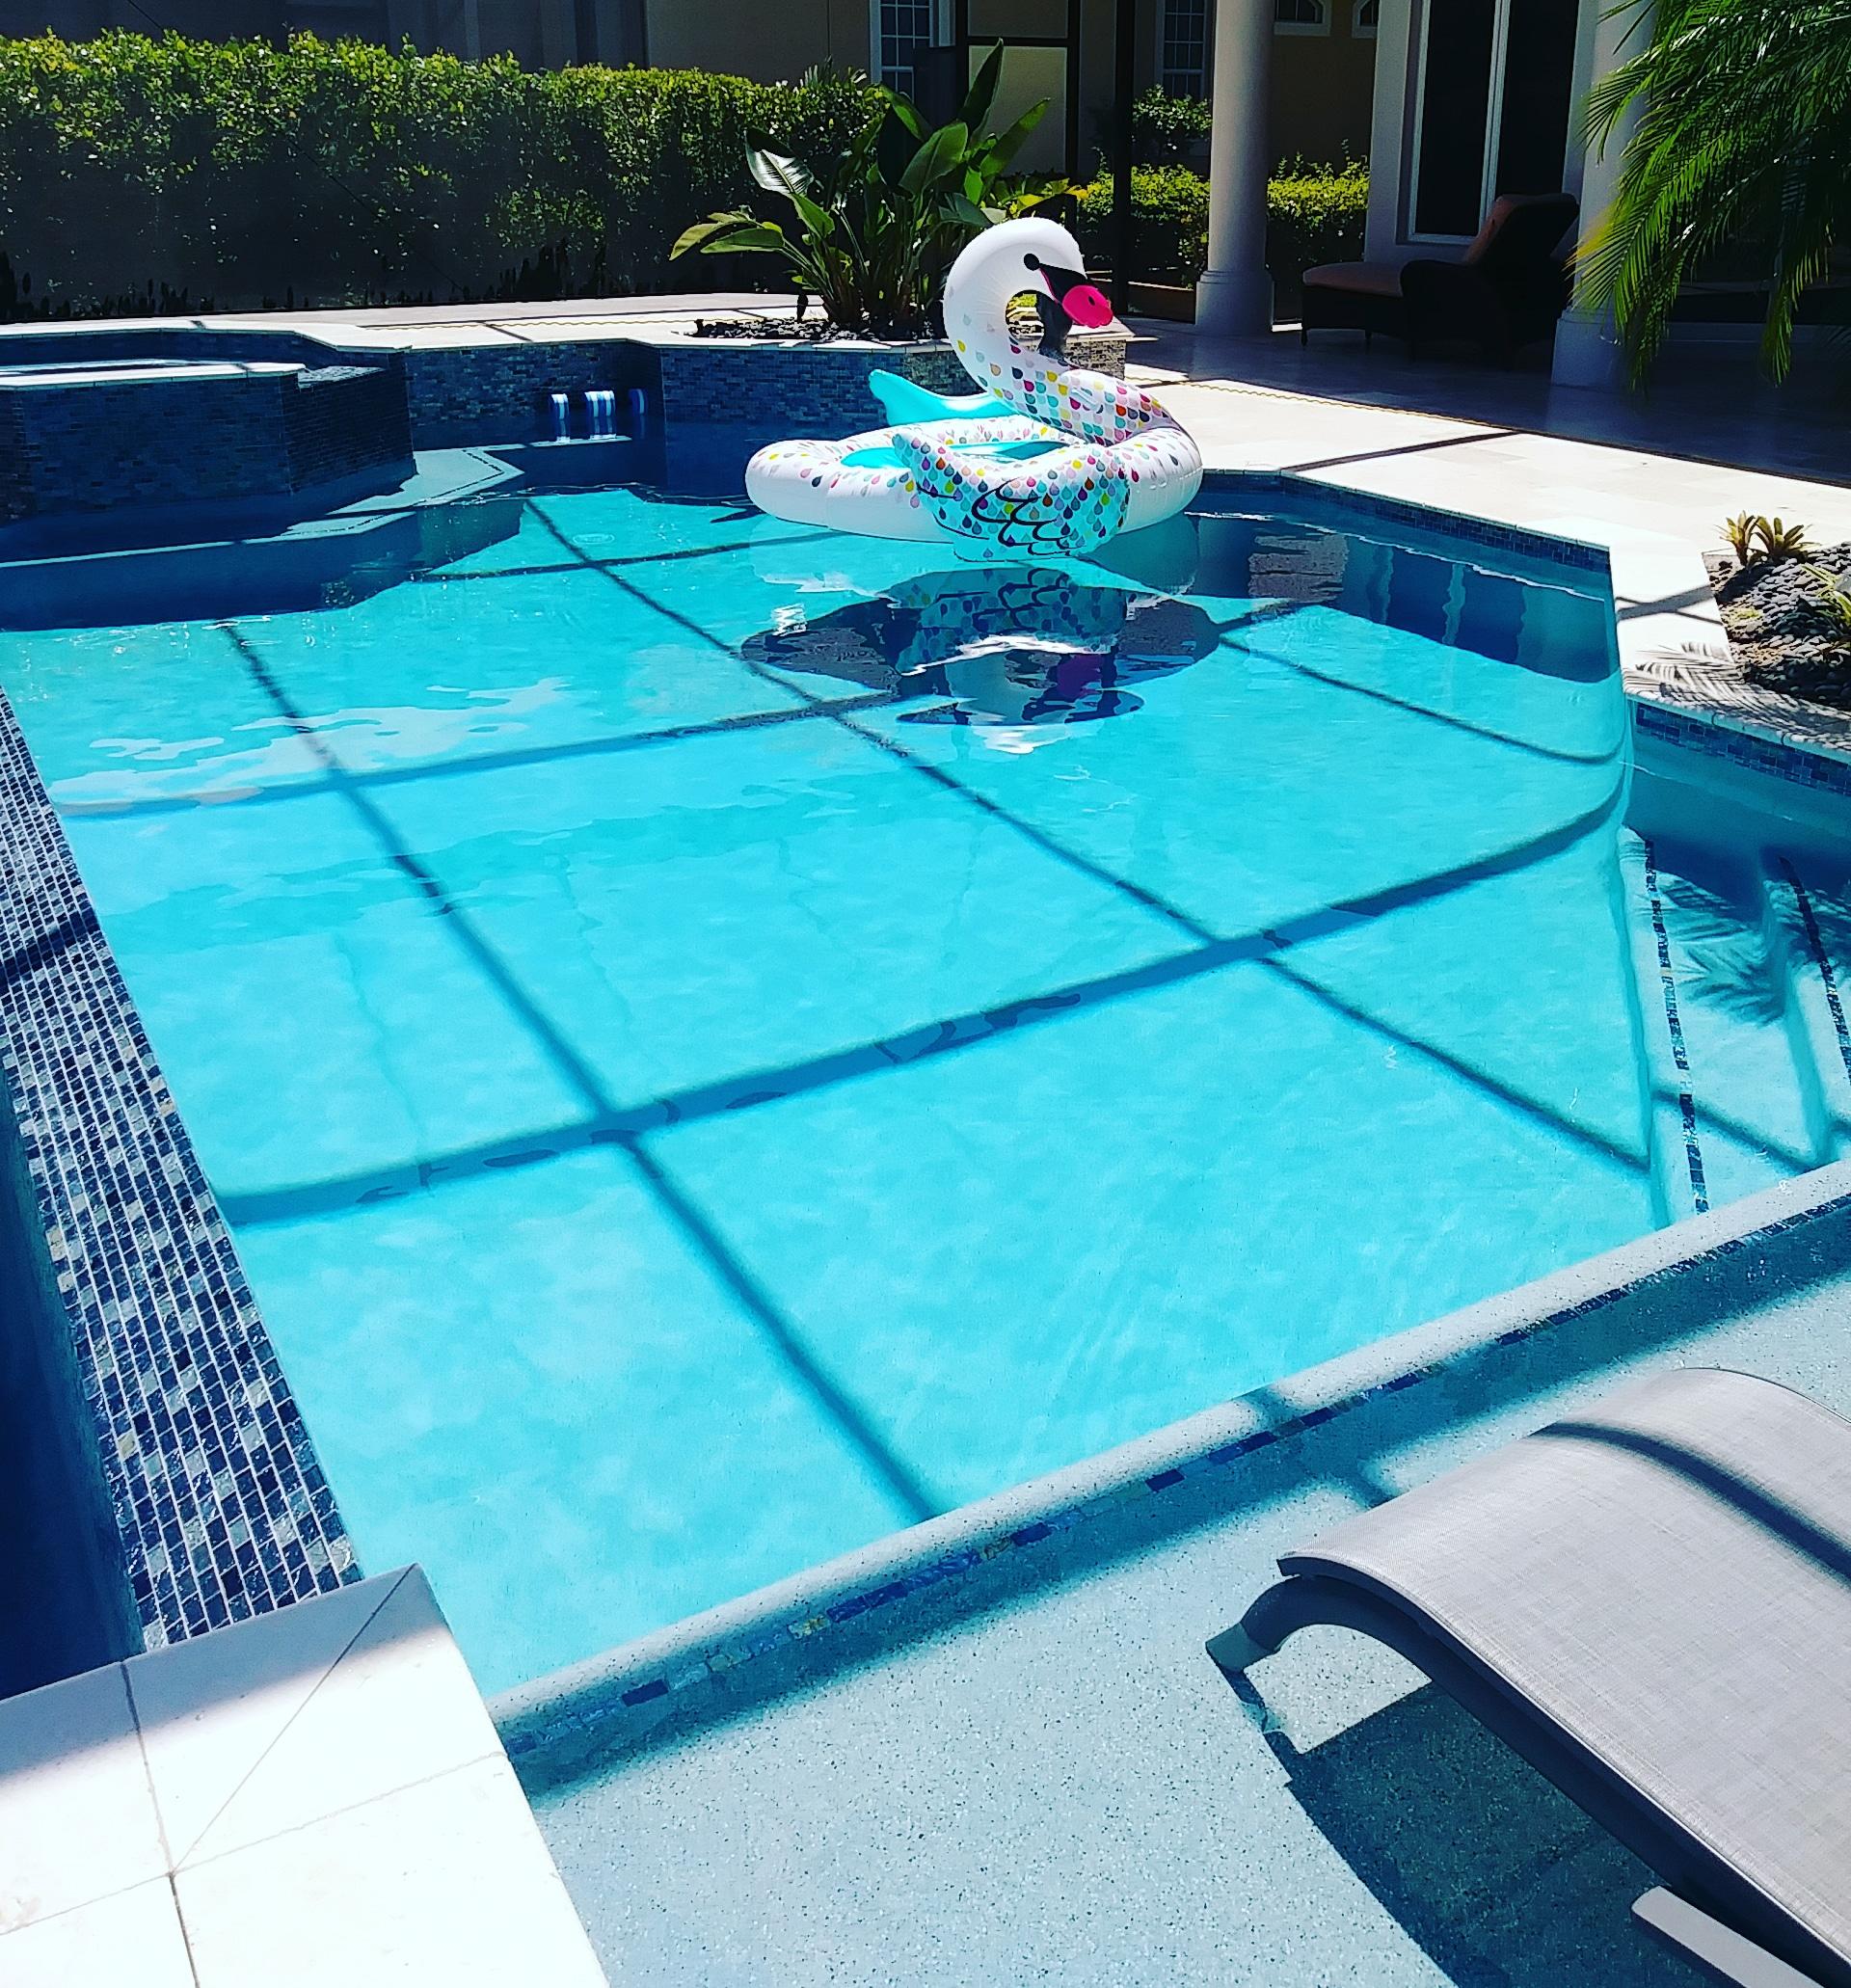 Pool Renovation with Sun Shelf